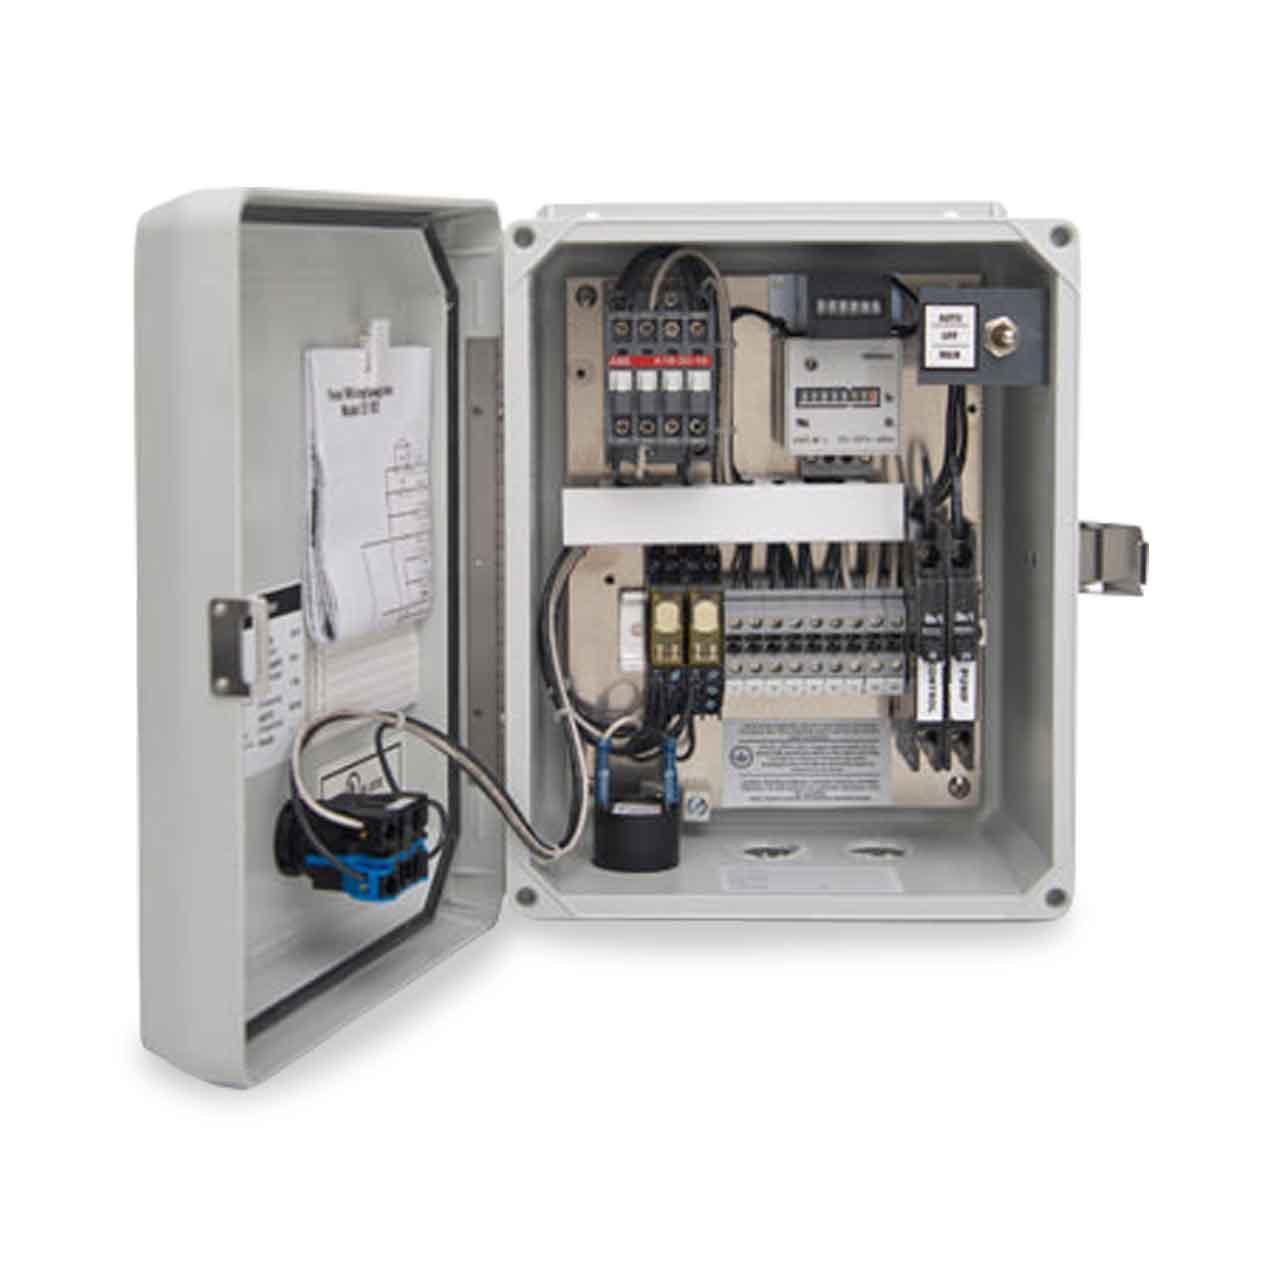 [DIAGRAM_3US]  Simplex Control Panel | Sewage Pump Control Panel | Wiring Diagram Septic Control Relay |  | RC Worst & Co.